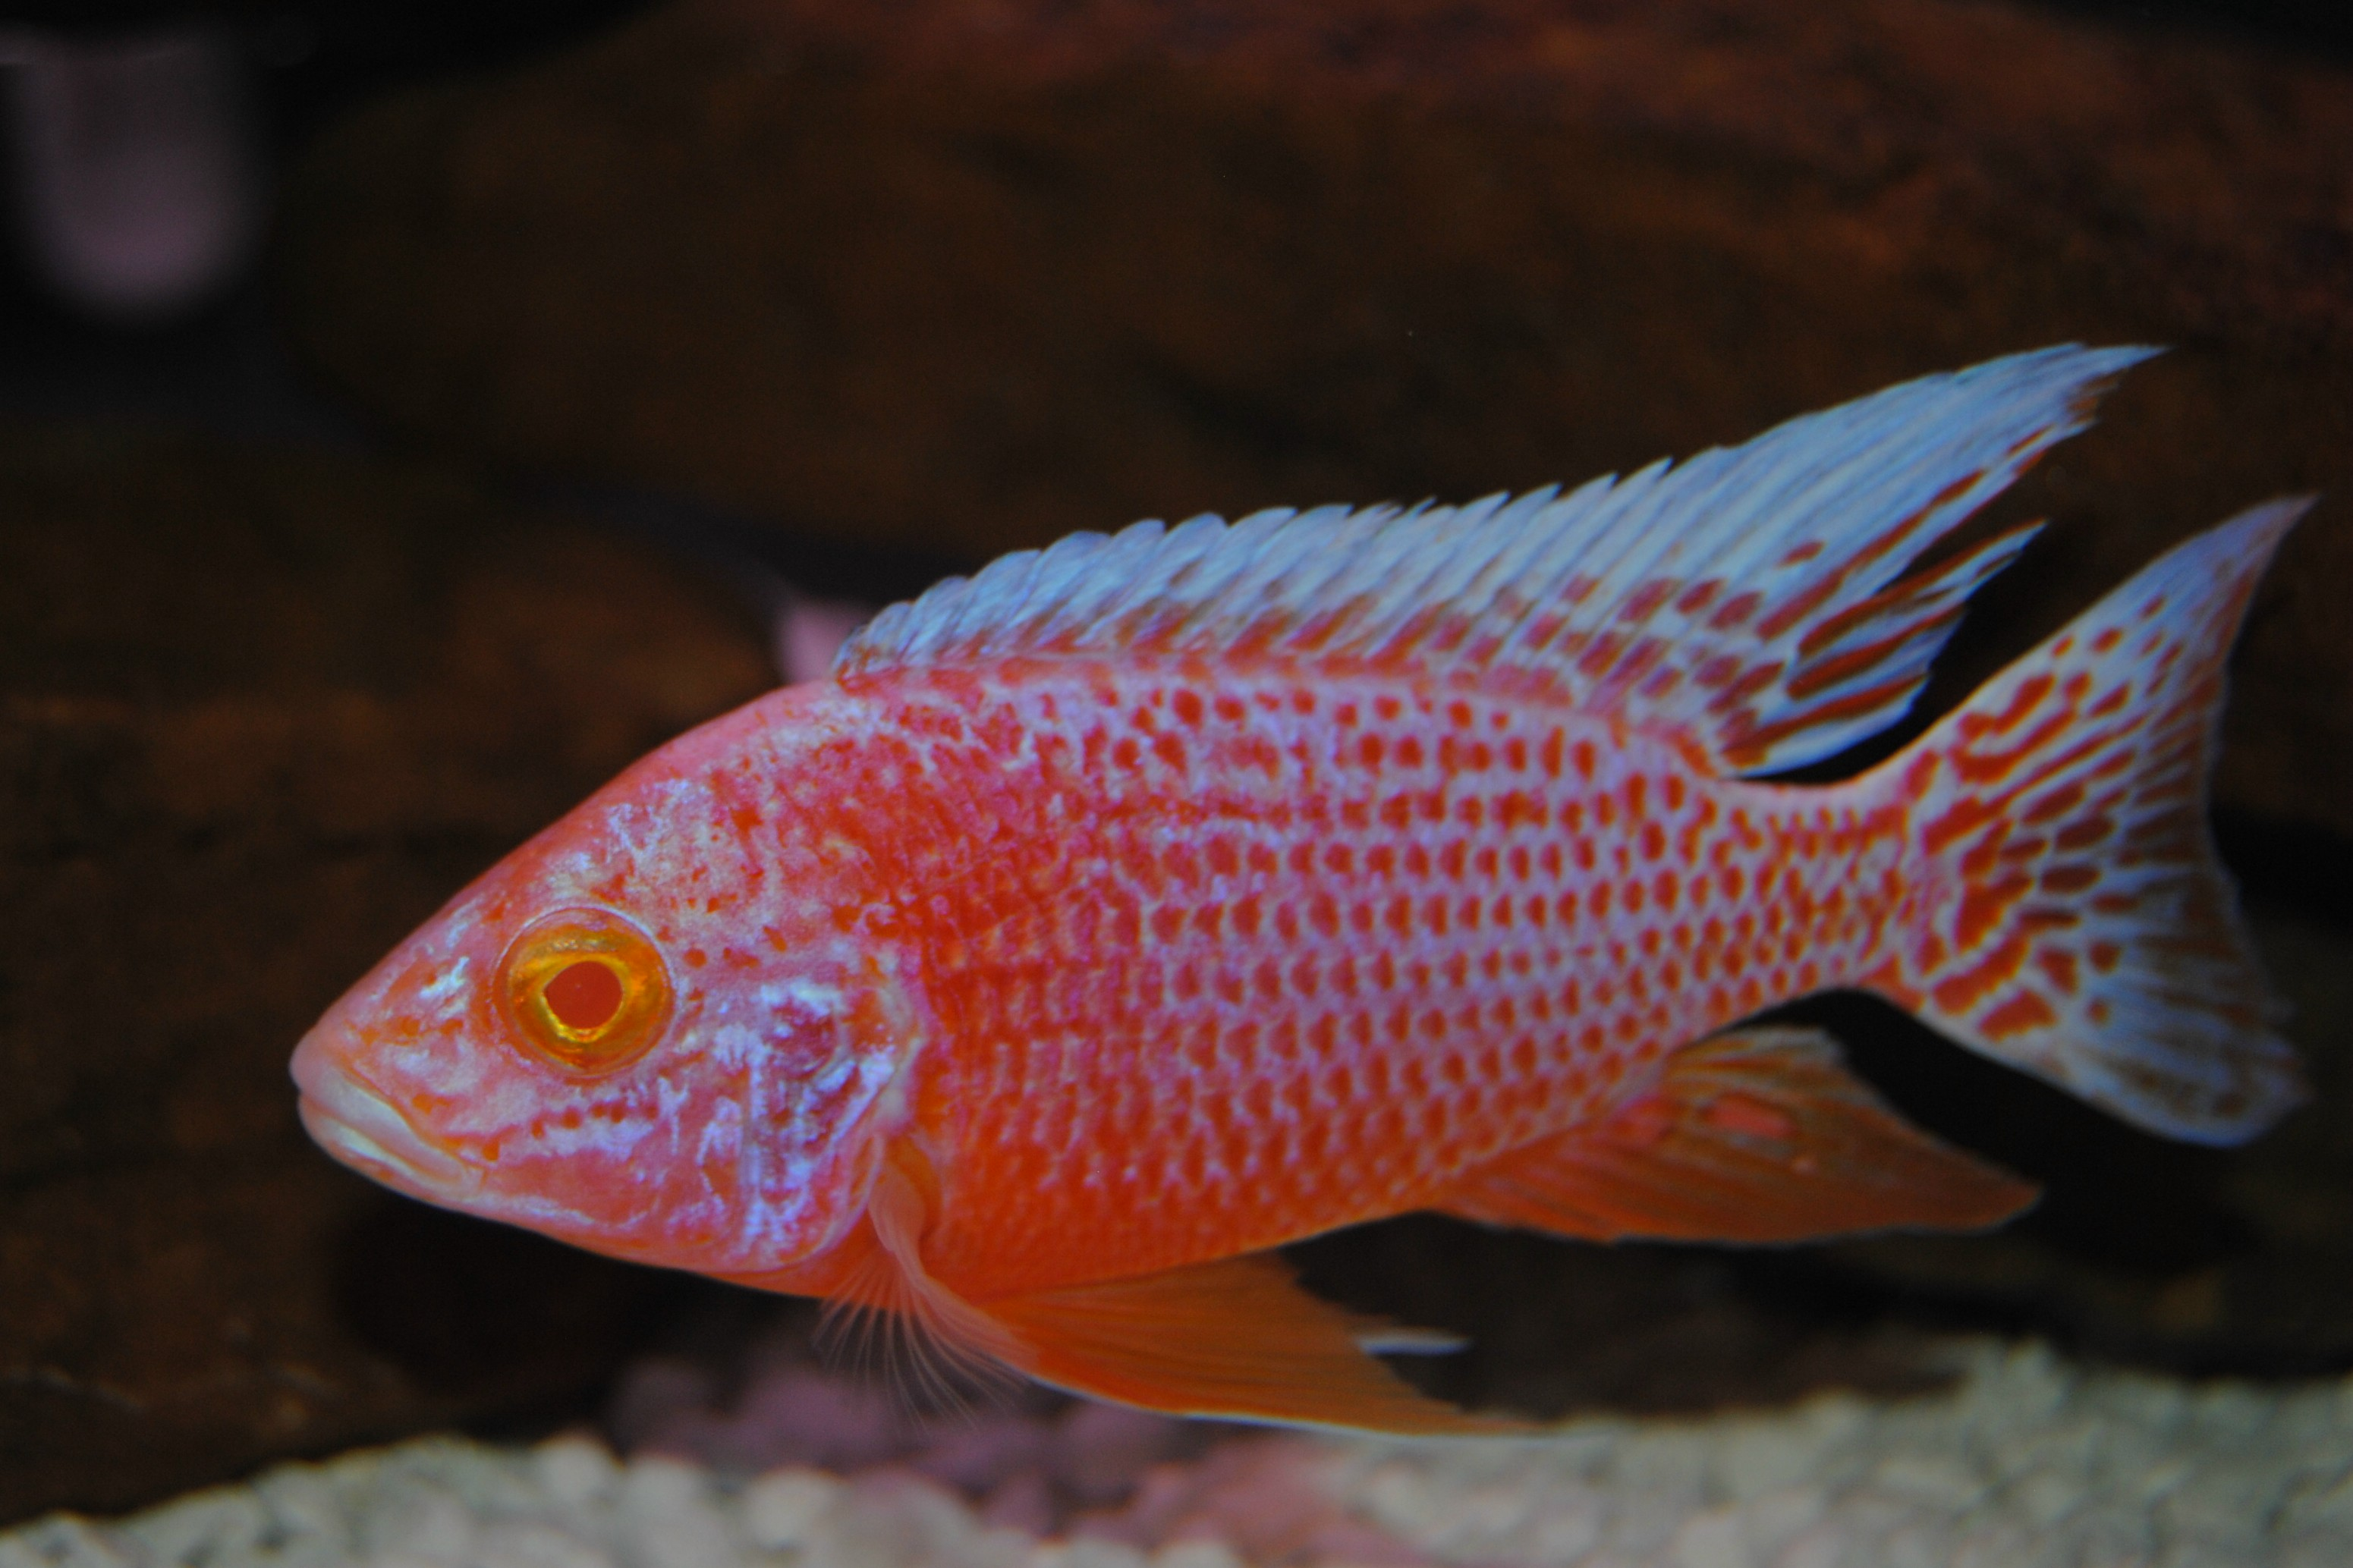 Dragon Blood Peacock Cichlid cichlids.com: A...